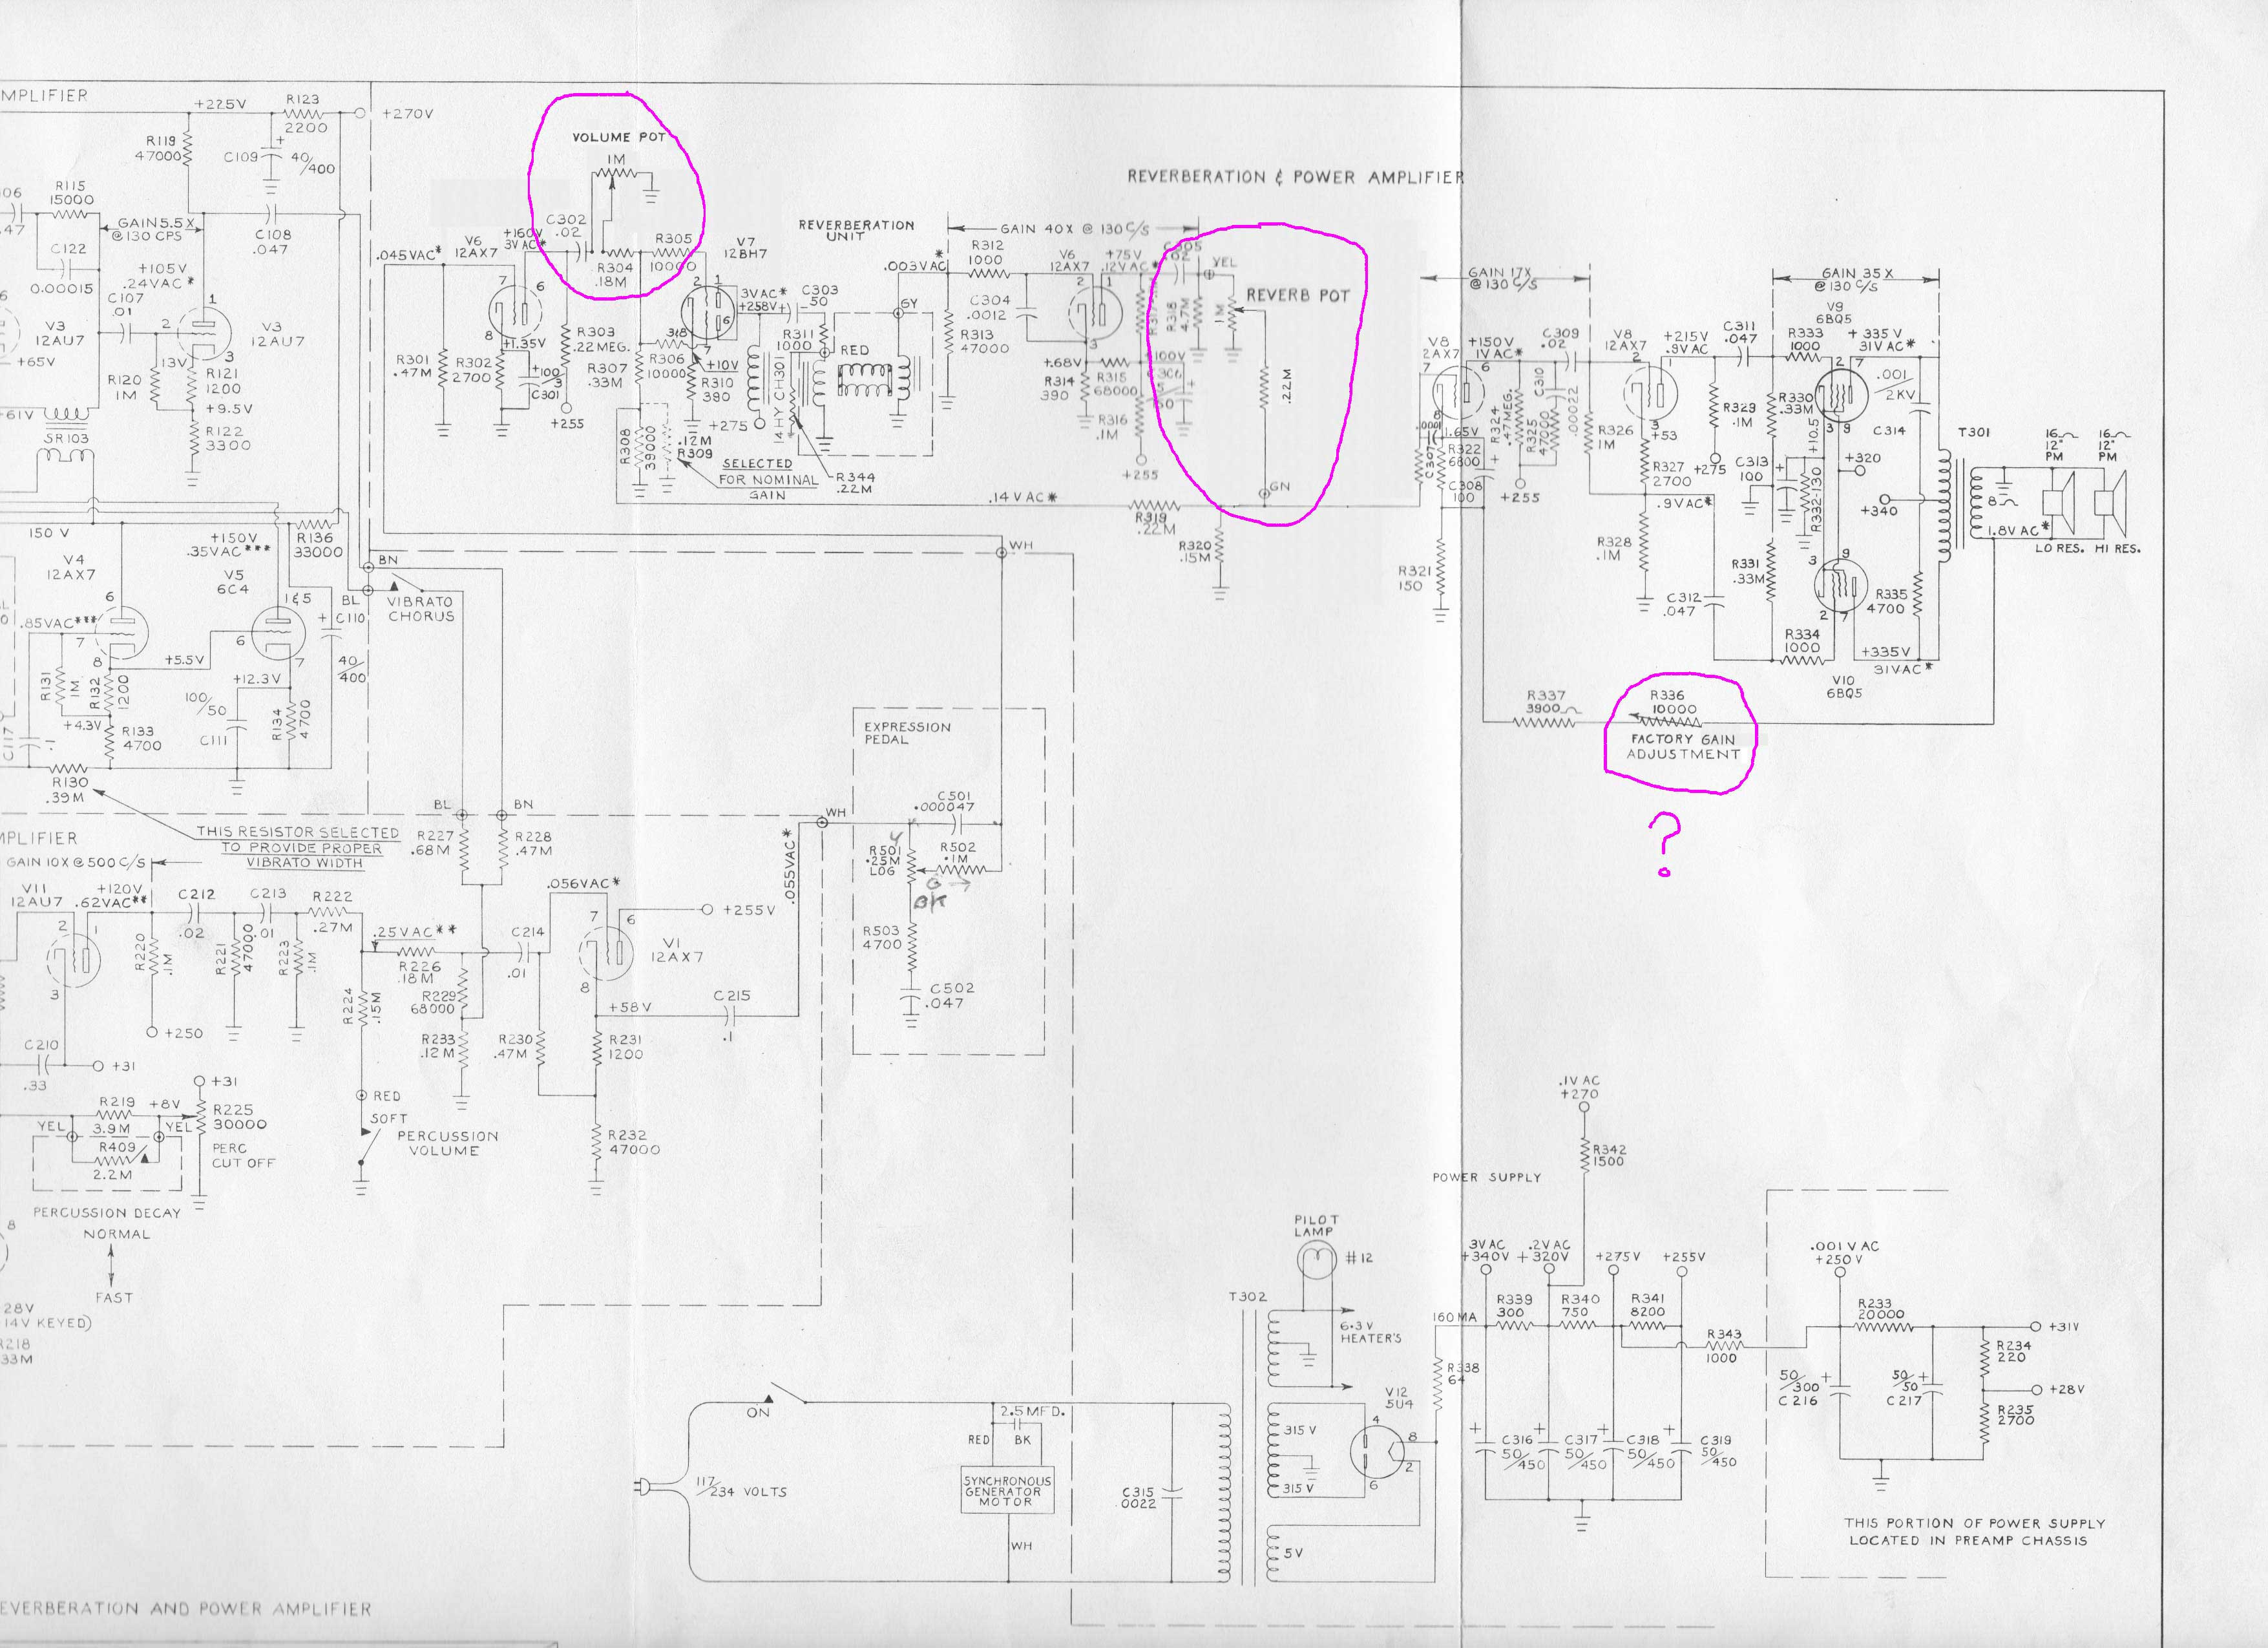 Usb Powered Audio Lifier Circuit Schematic USB Audio